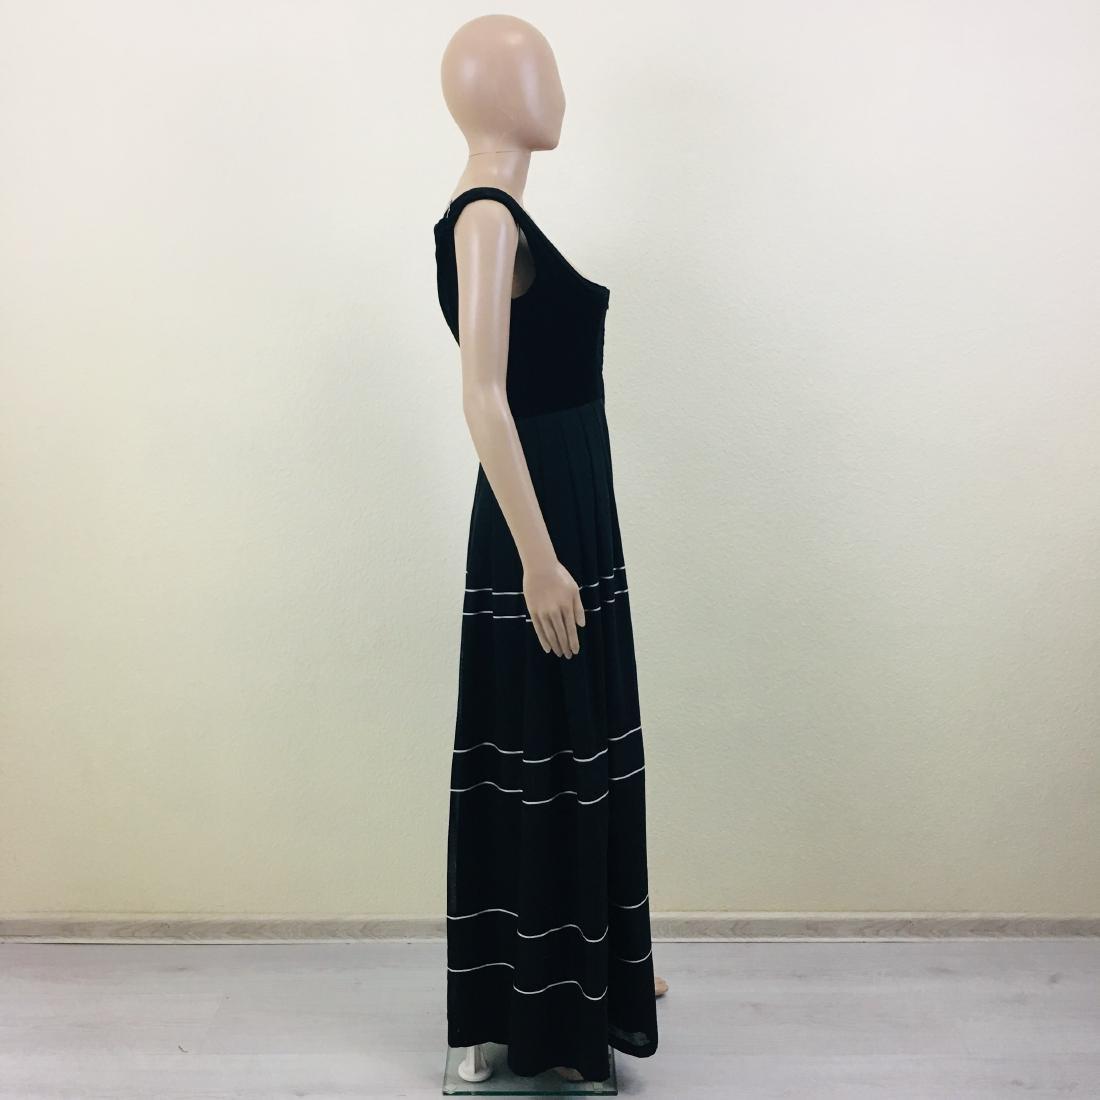 Vintage Women's Black Tyrolean Drindl Dress - 6